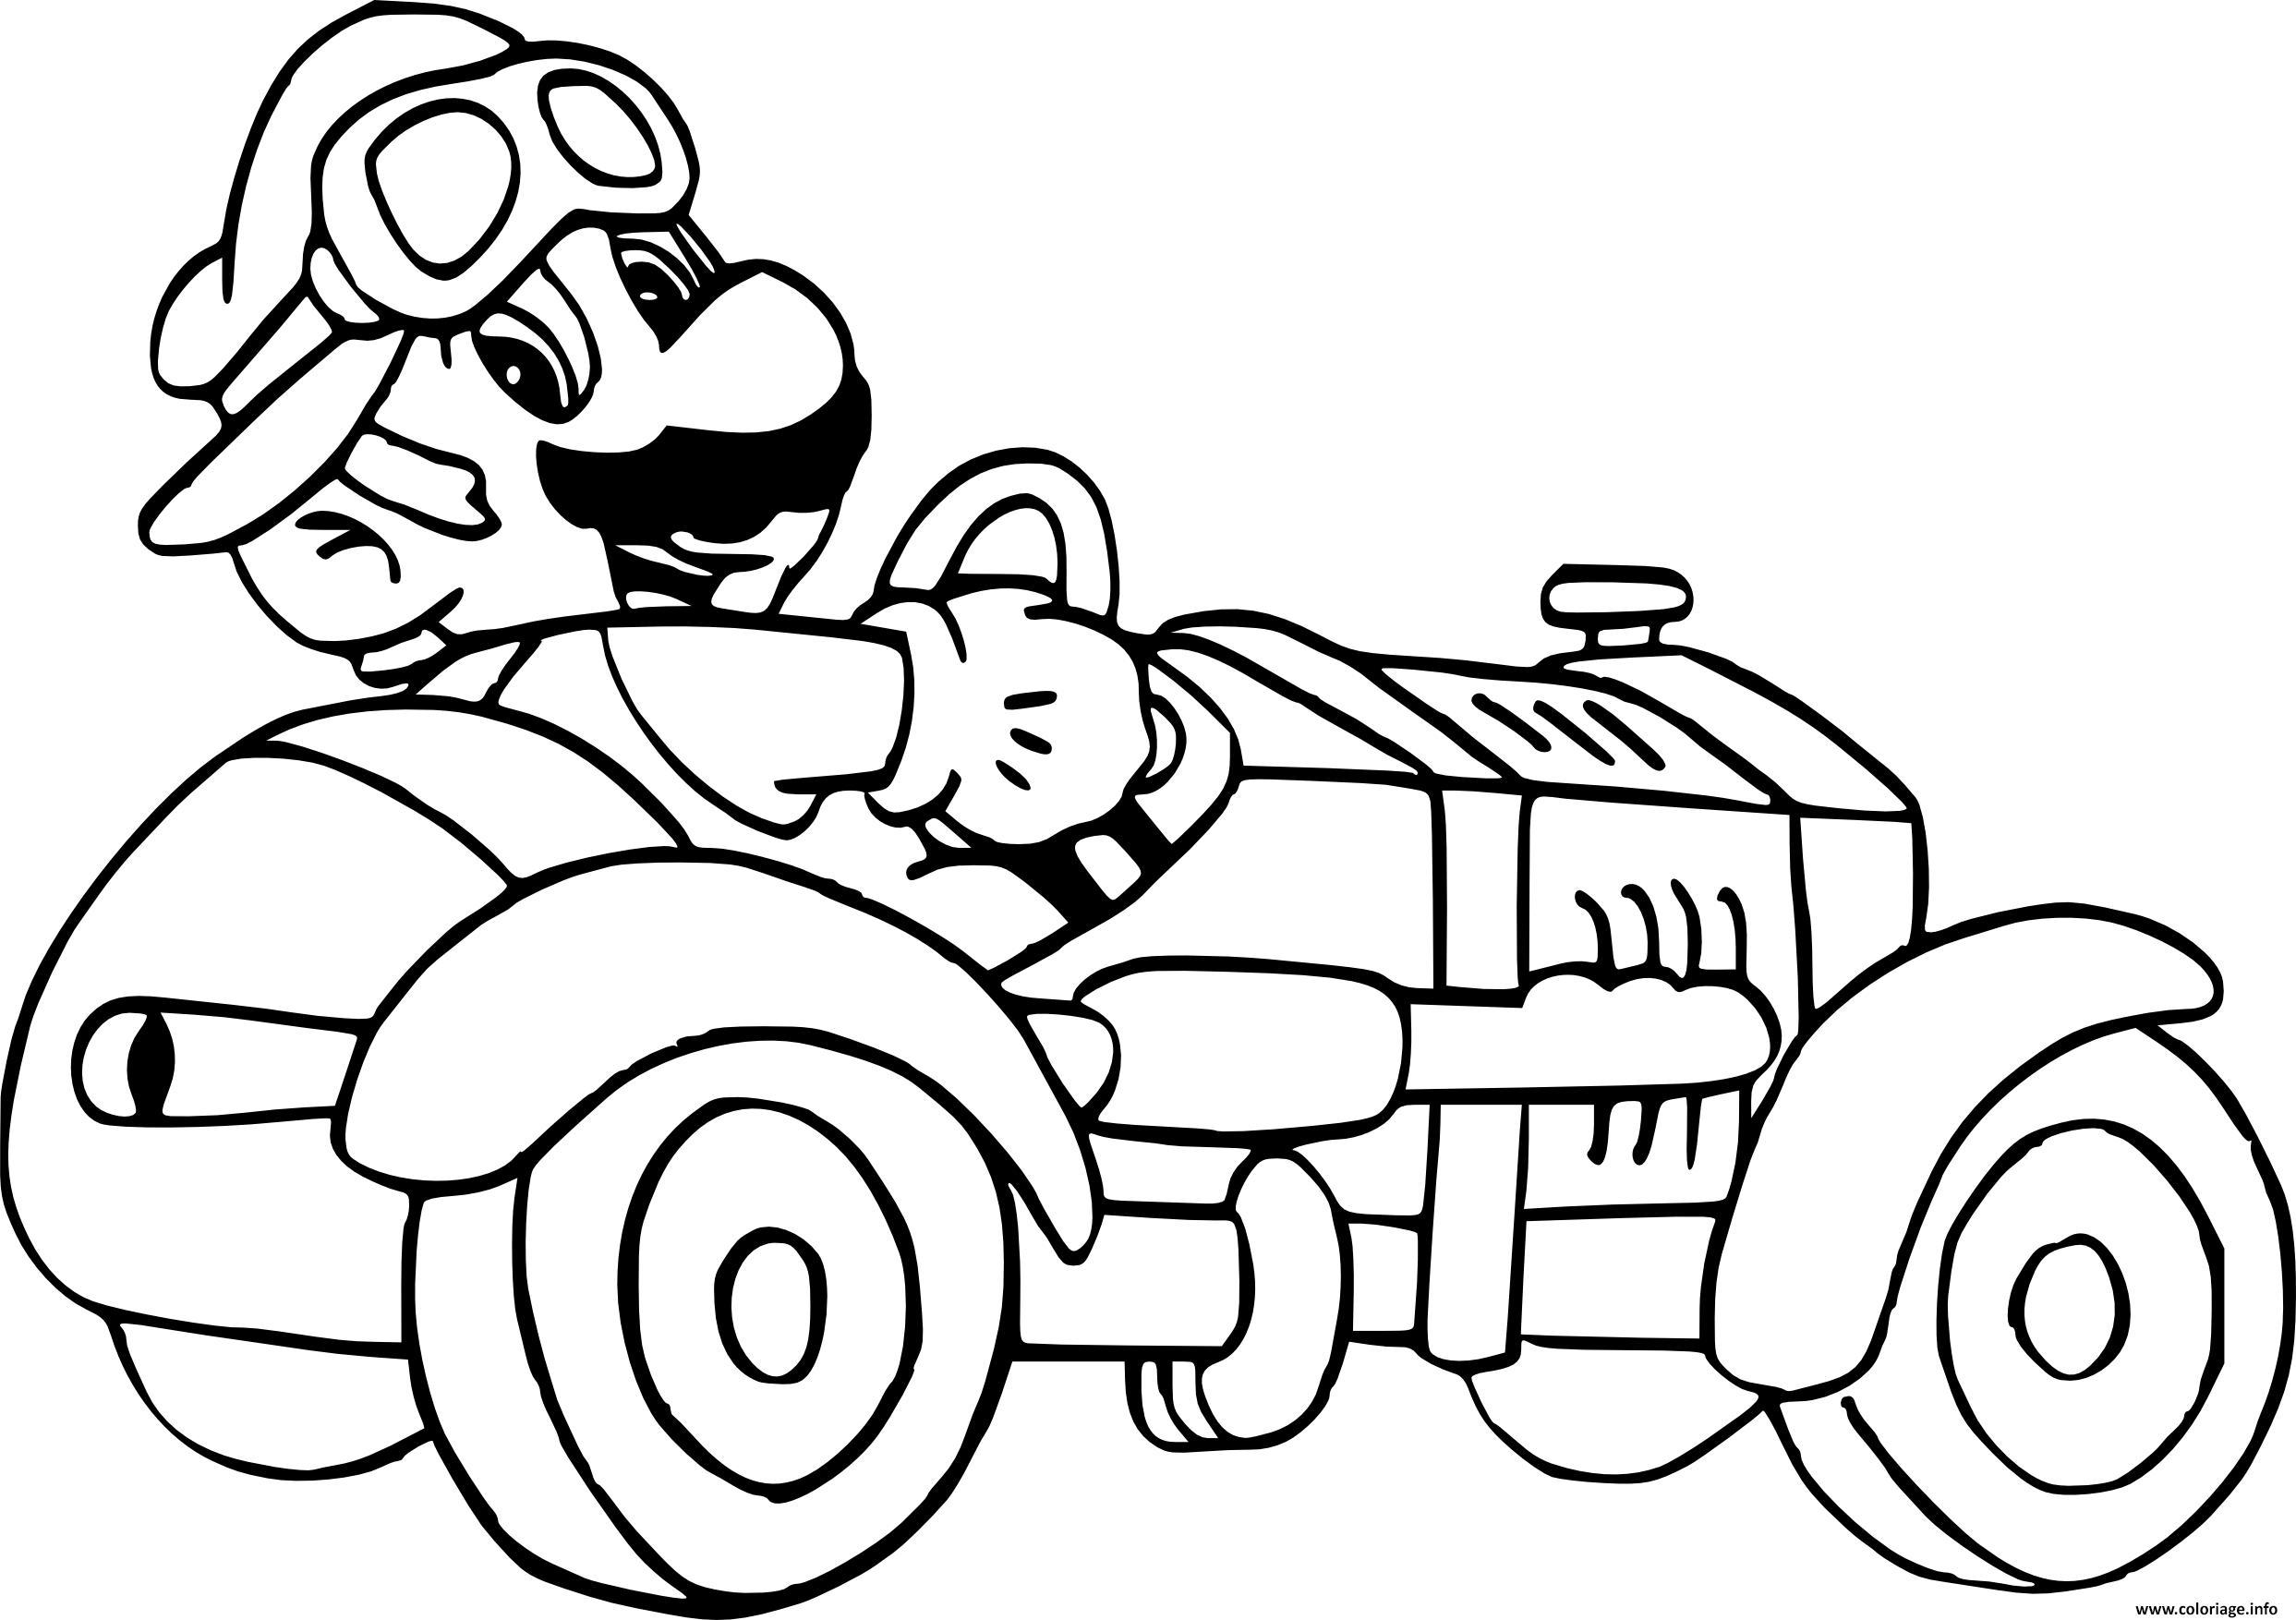 Coloriage mario kart ancienne voiture - Dessin mario kart ...